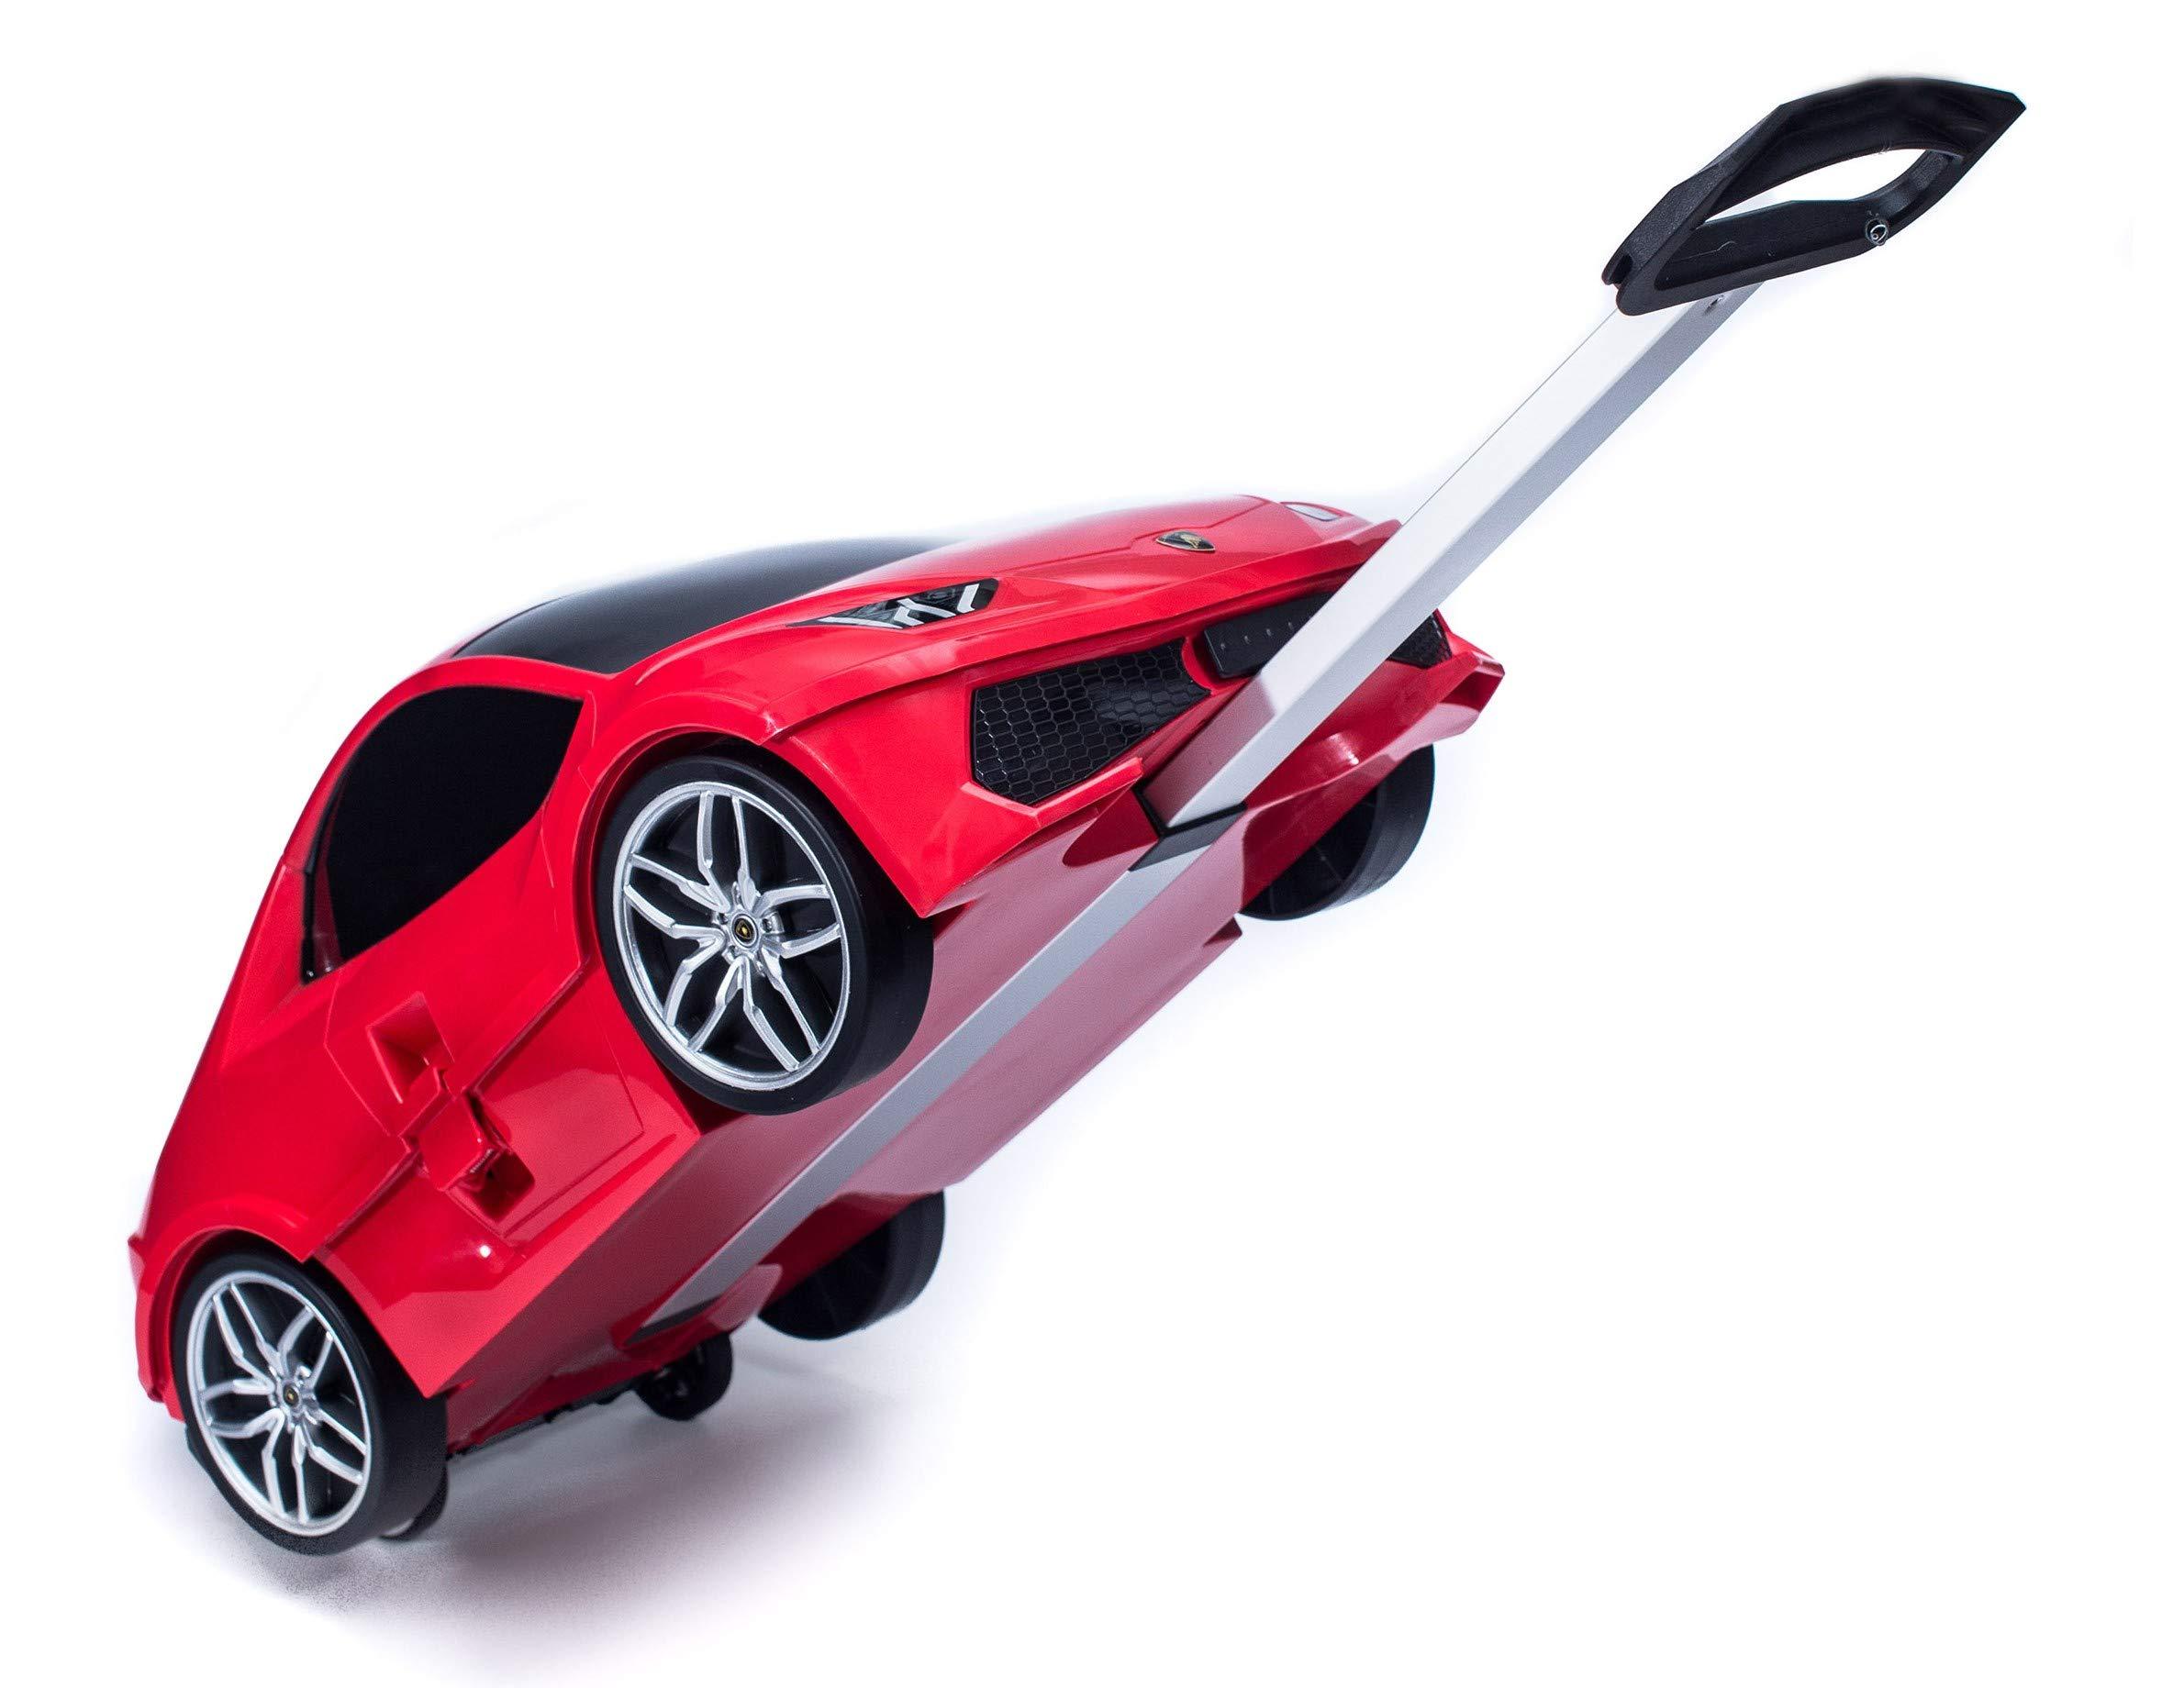 Ridaz Lamborghini Carry-on Hand Luggage for kids, Red Lamborghini